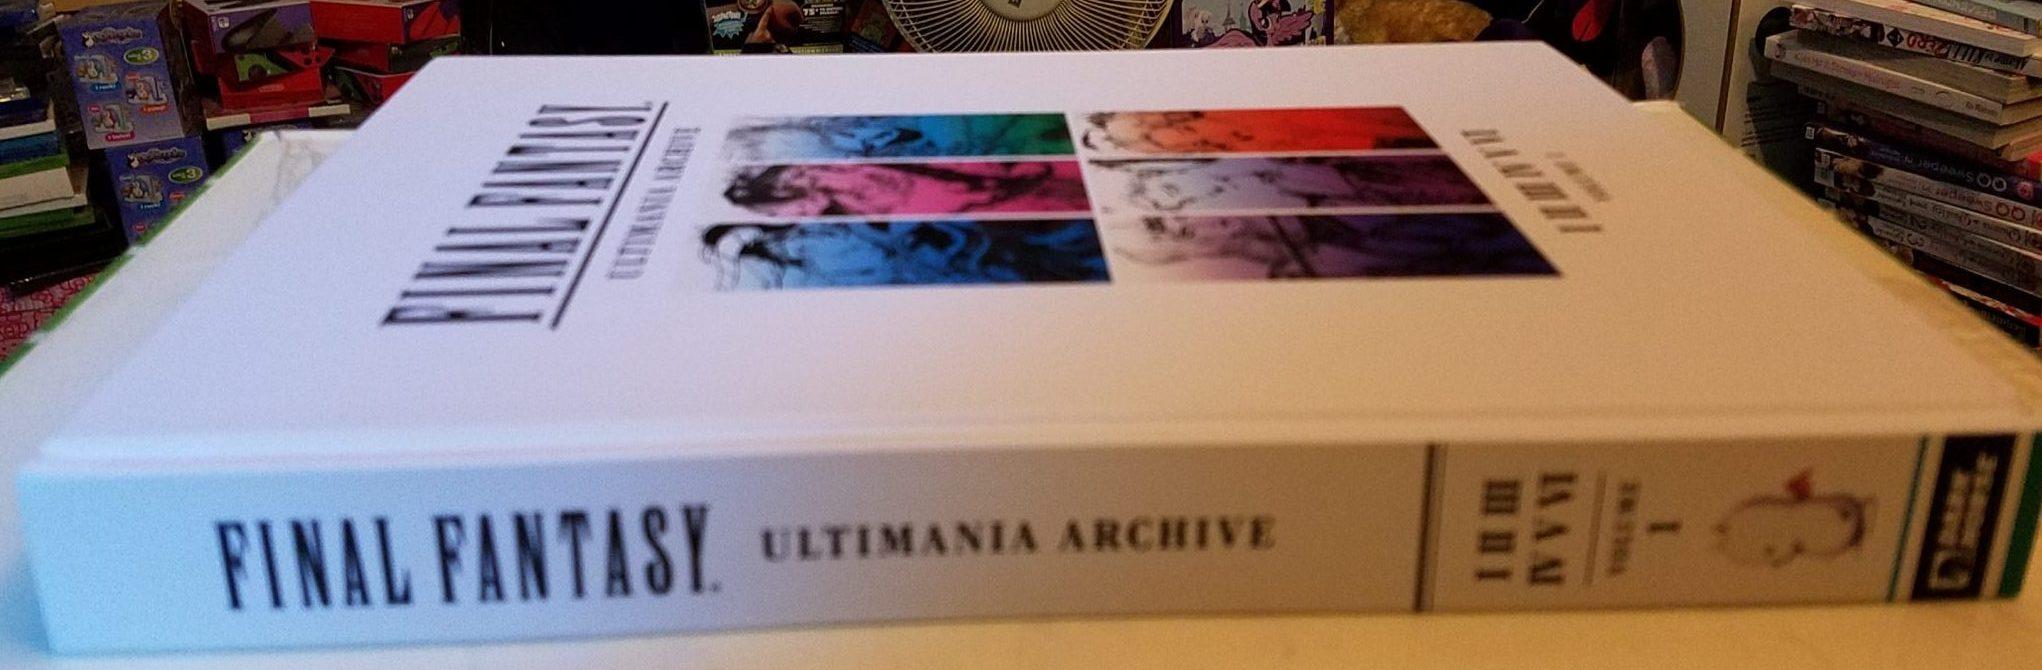 Final Fantasy Ultimania Archive 1 Spine